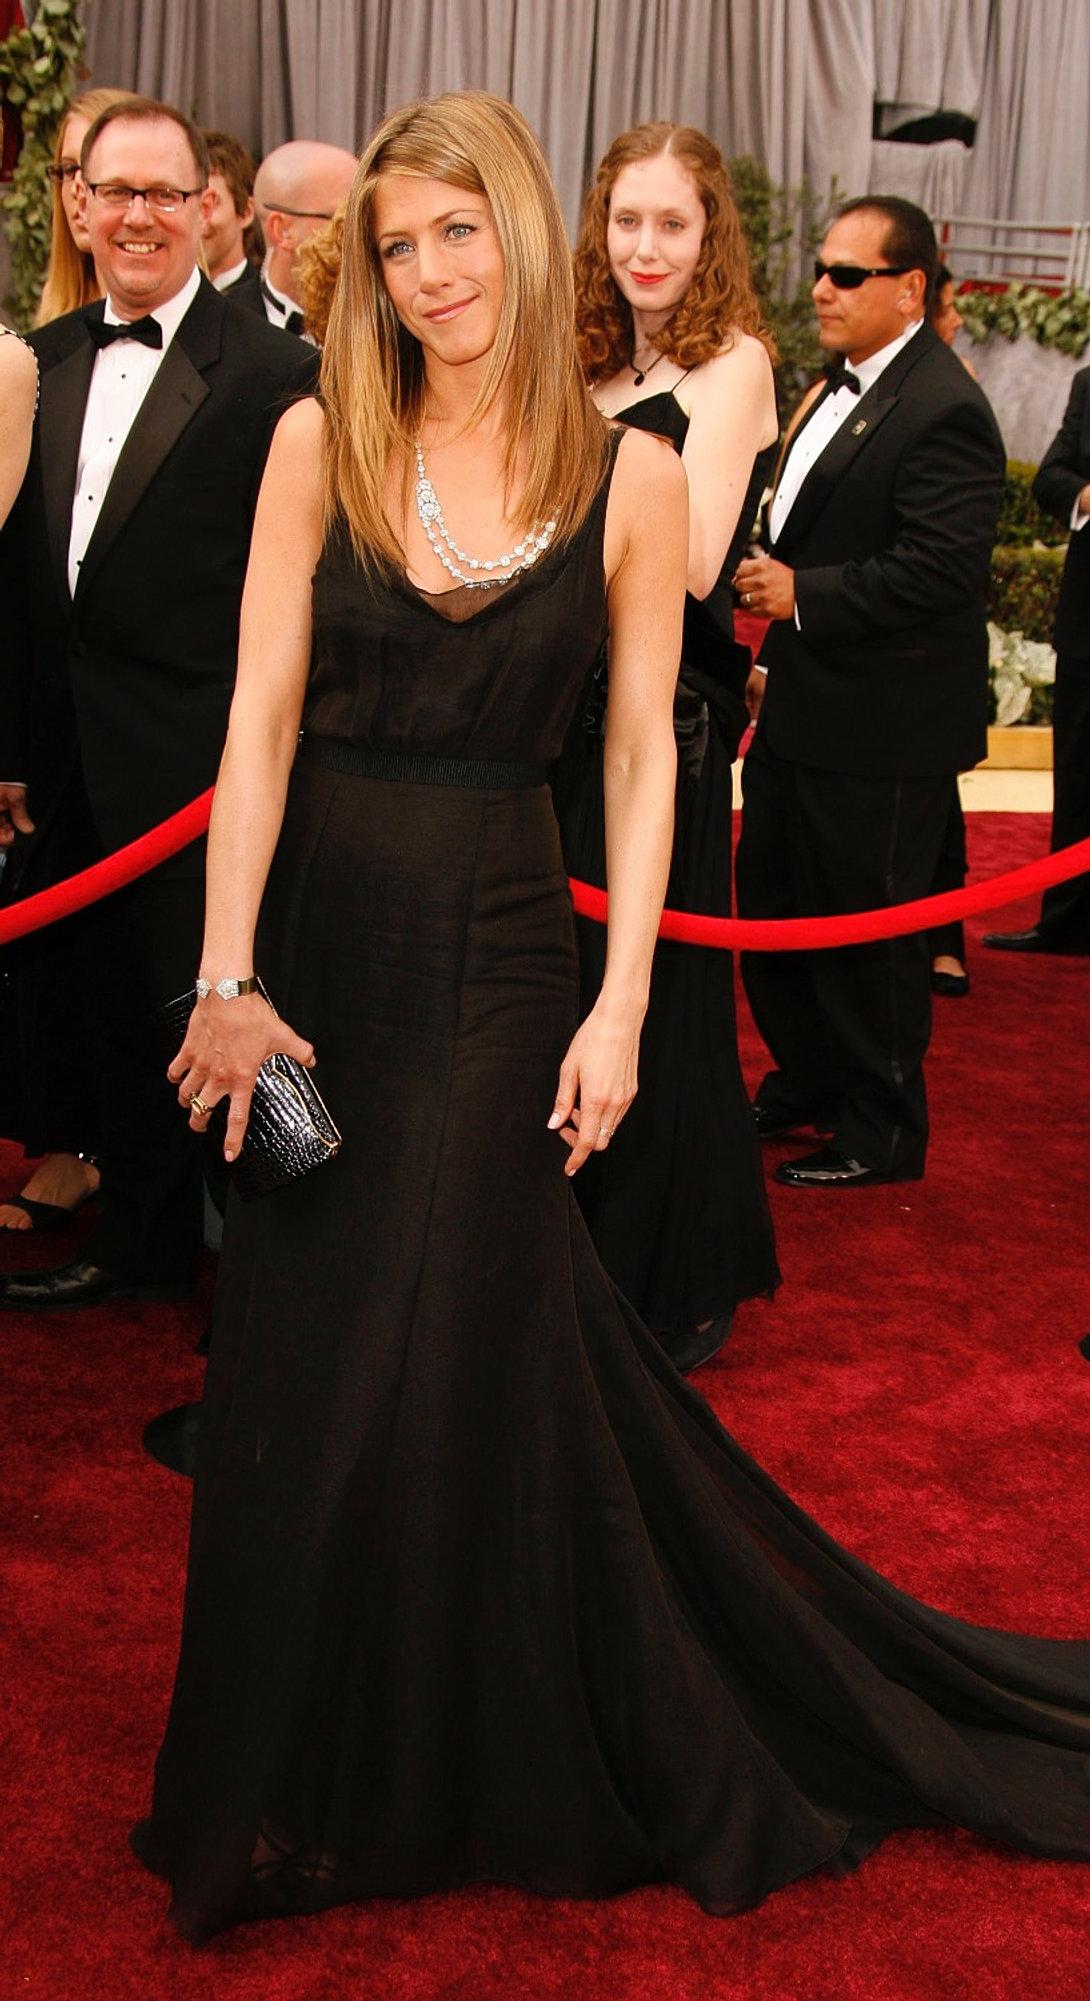 LANA MARKS - ON THE RED CARPET Angelina Jolie